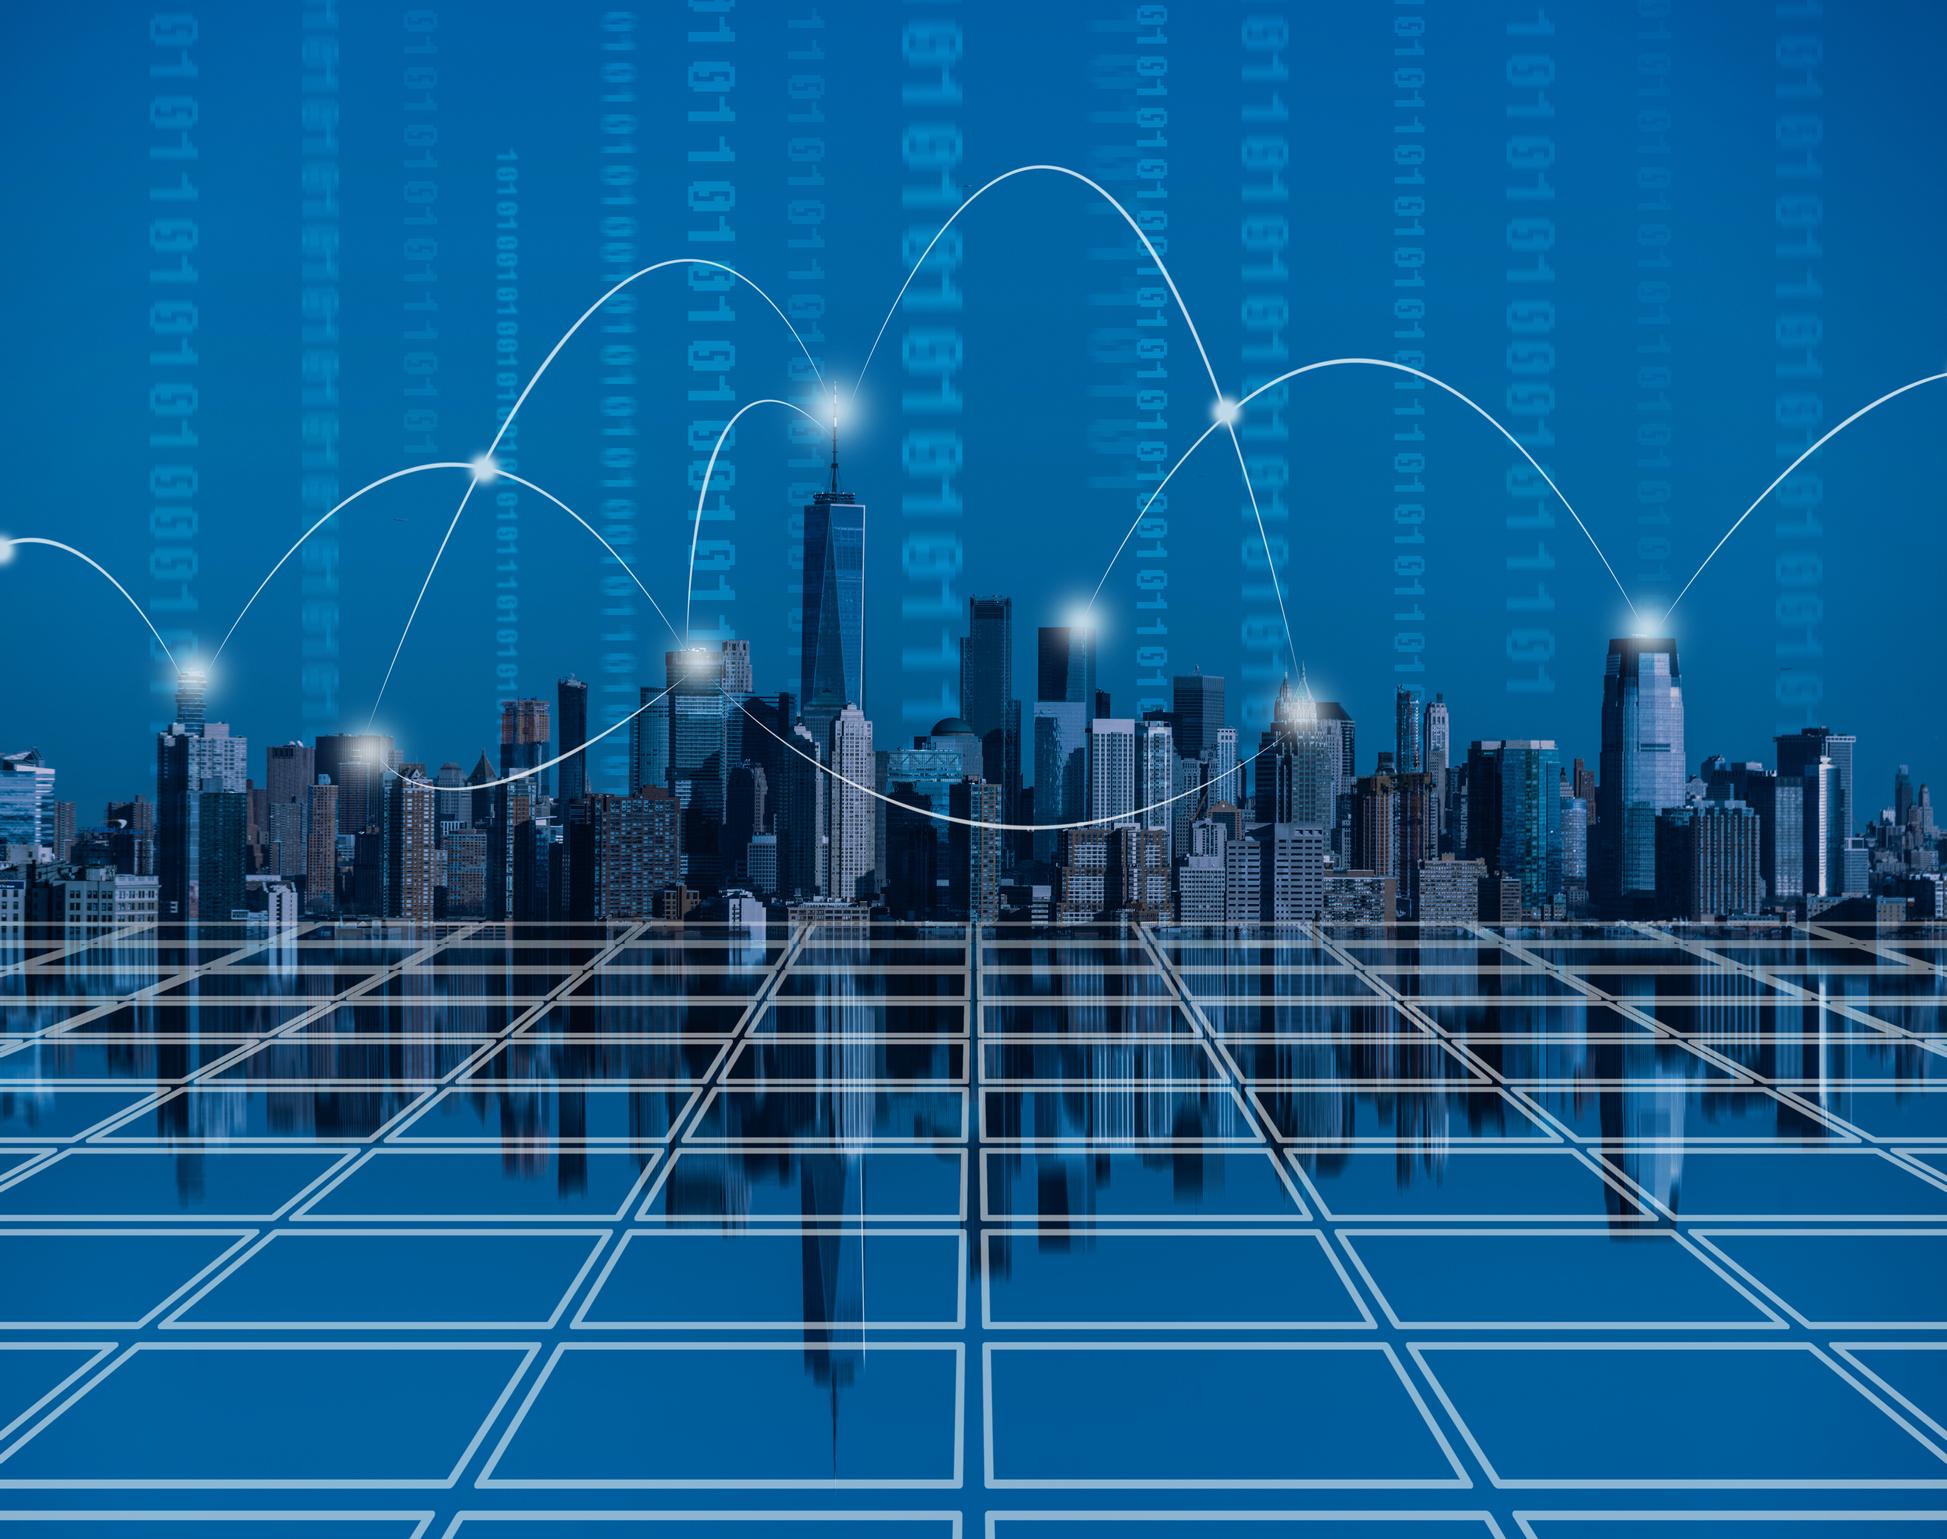 Digital City of Manhattan